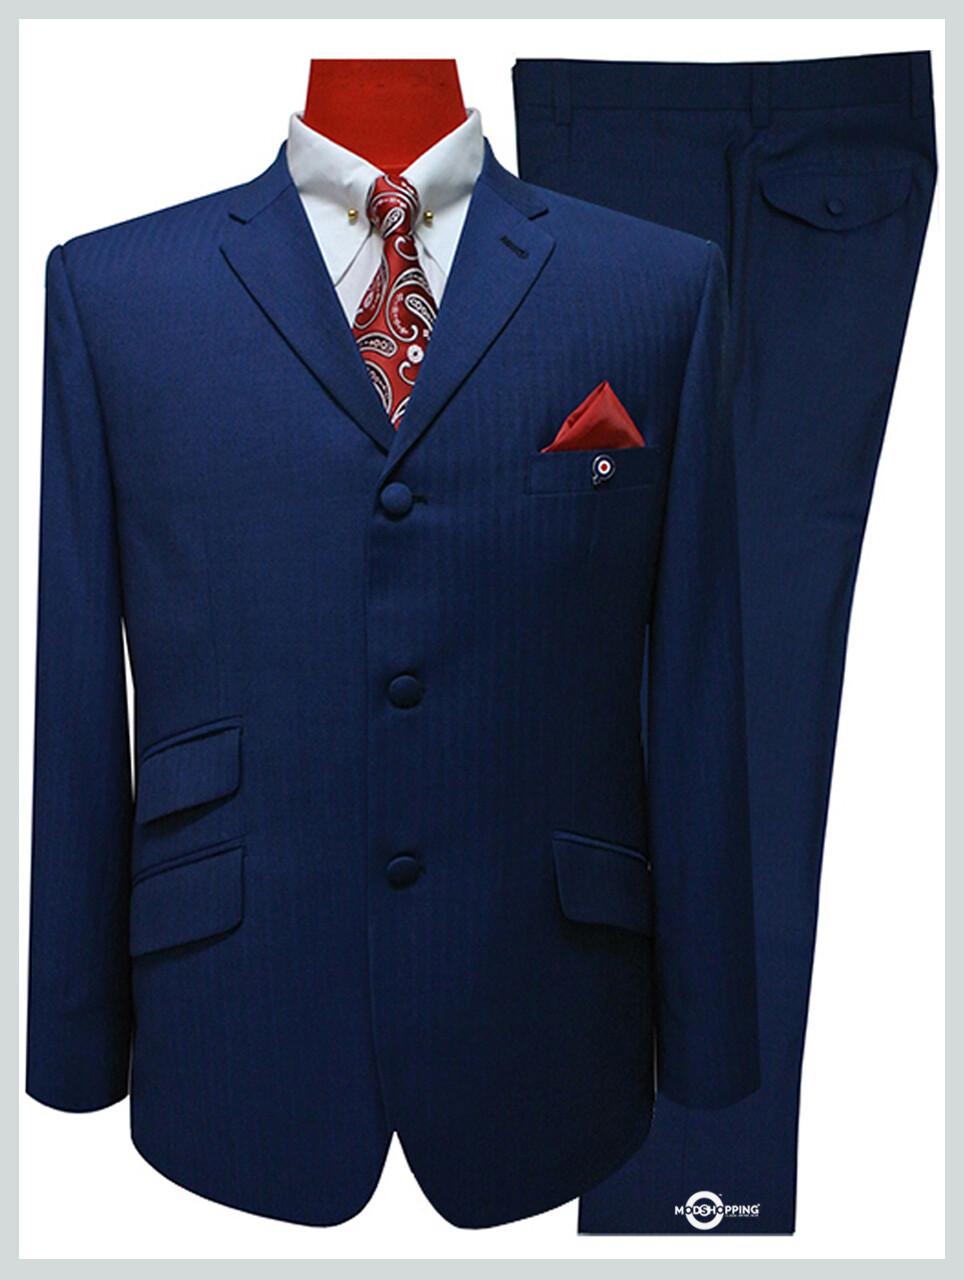 herringbone suit sapphire blue tailored mod suit for men